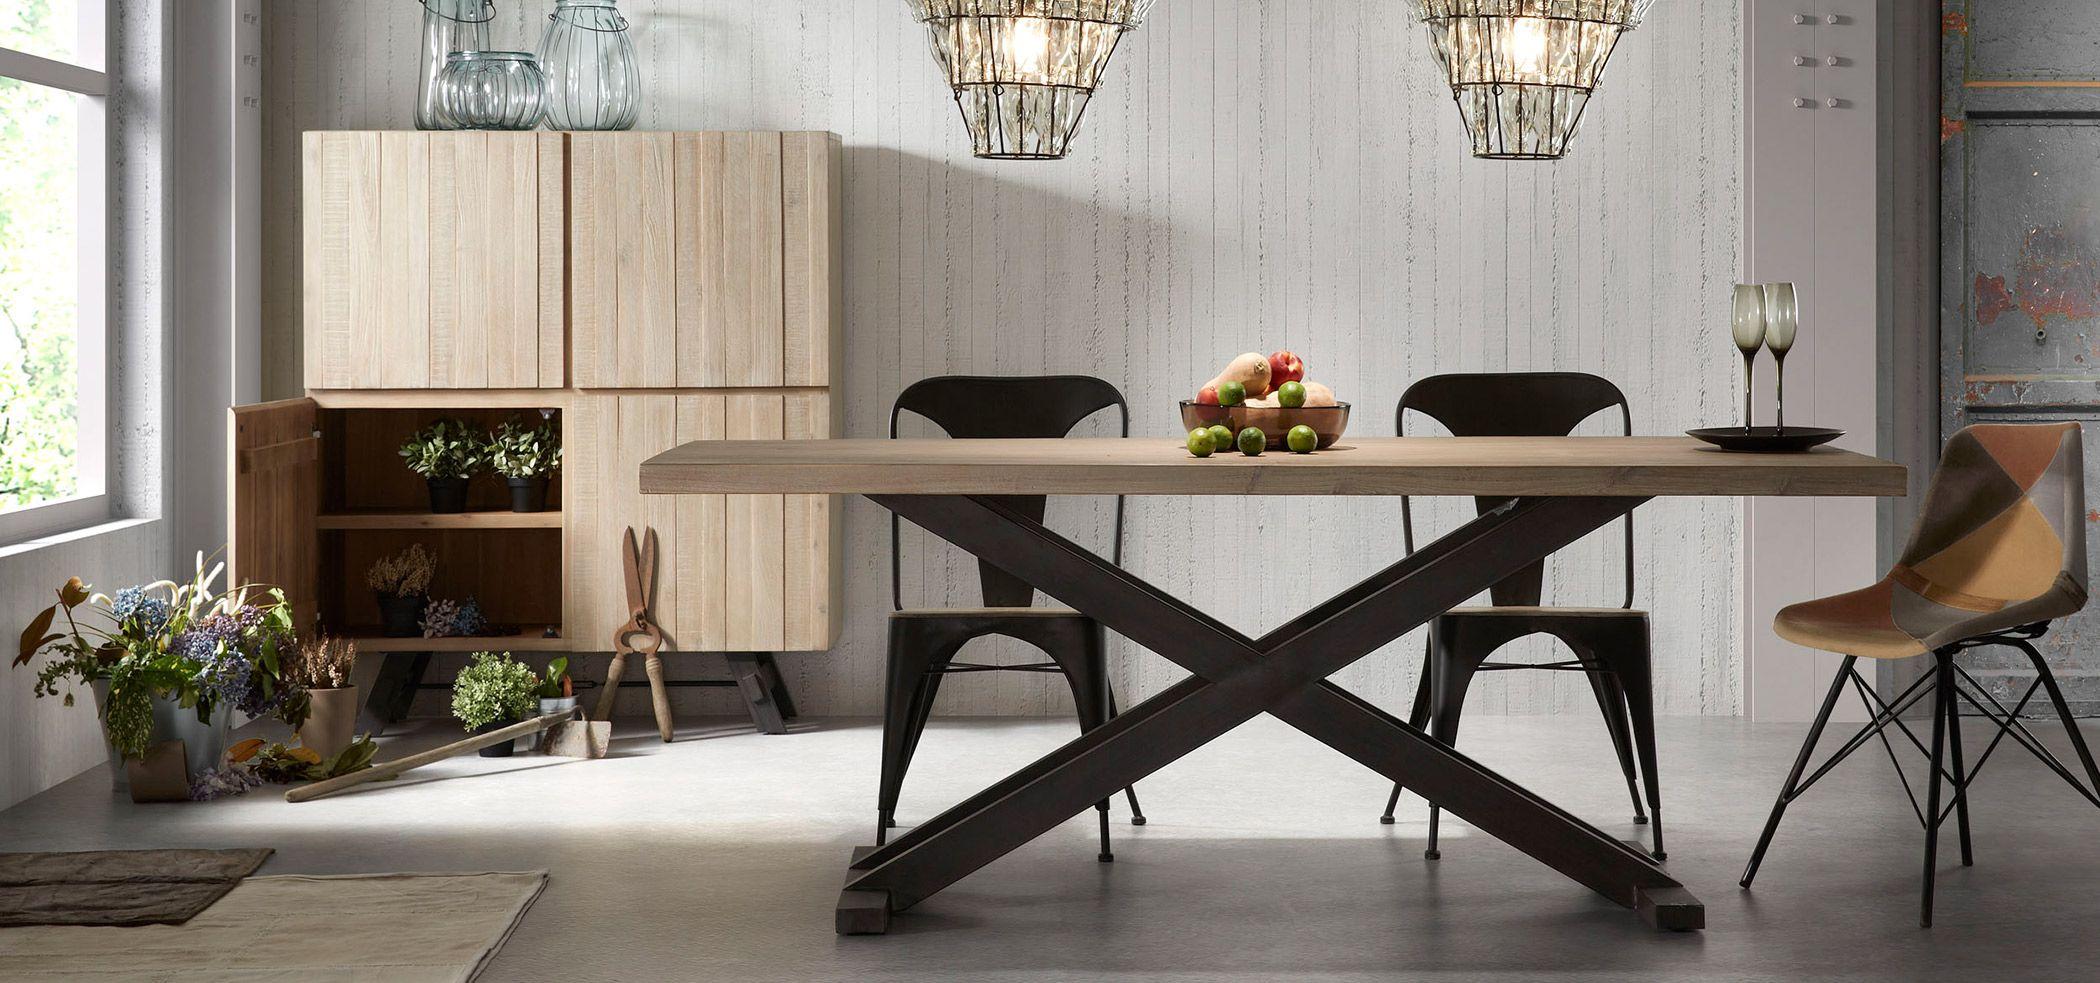 Mesa de comedor madera Tiva Material: Madera de Acacia Descripcion ...